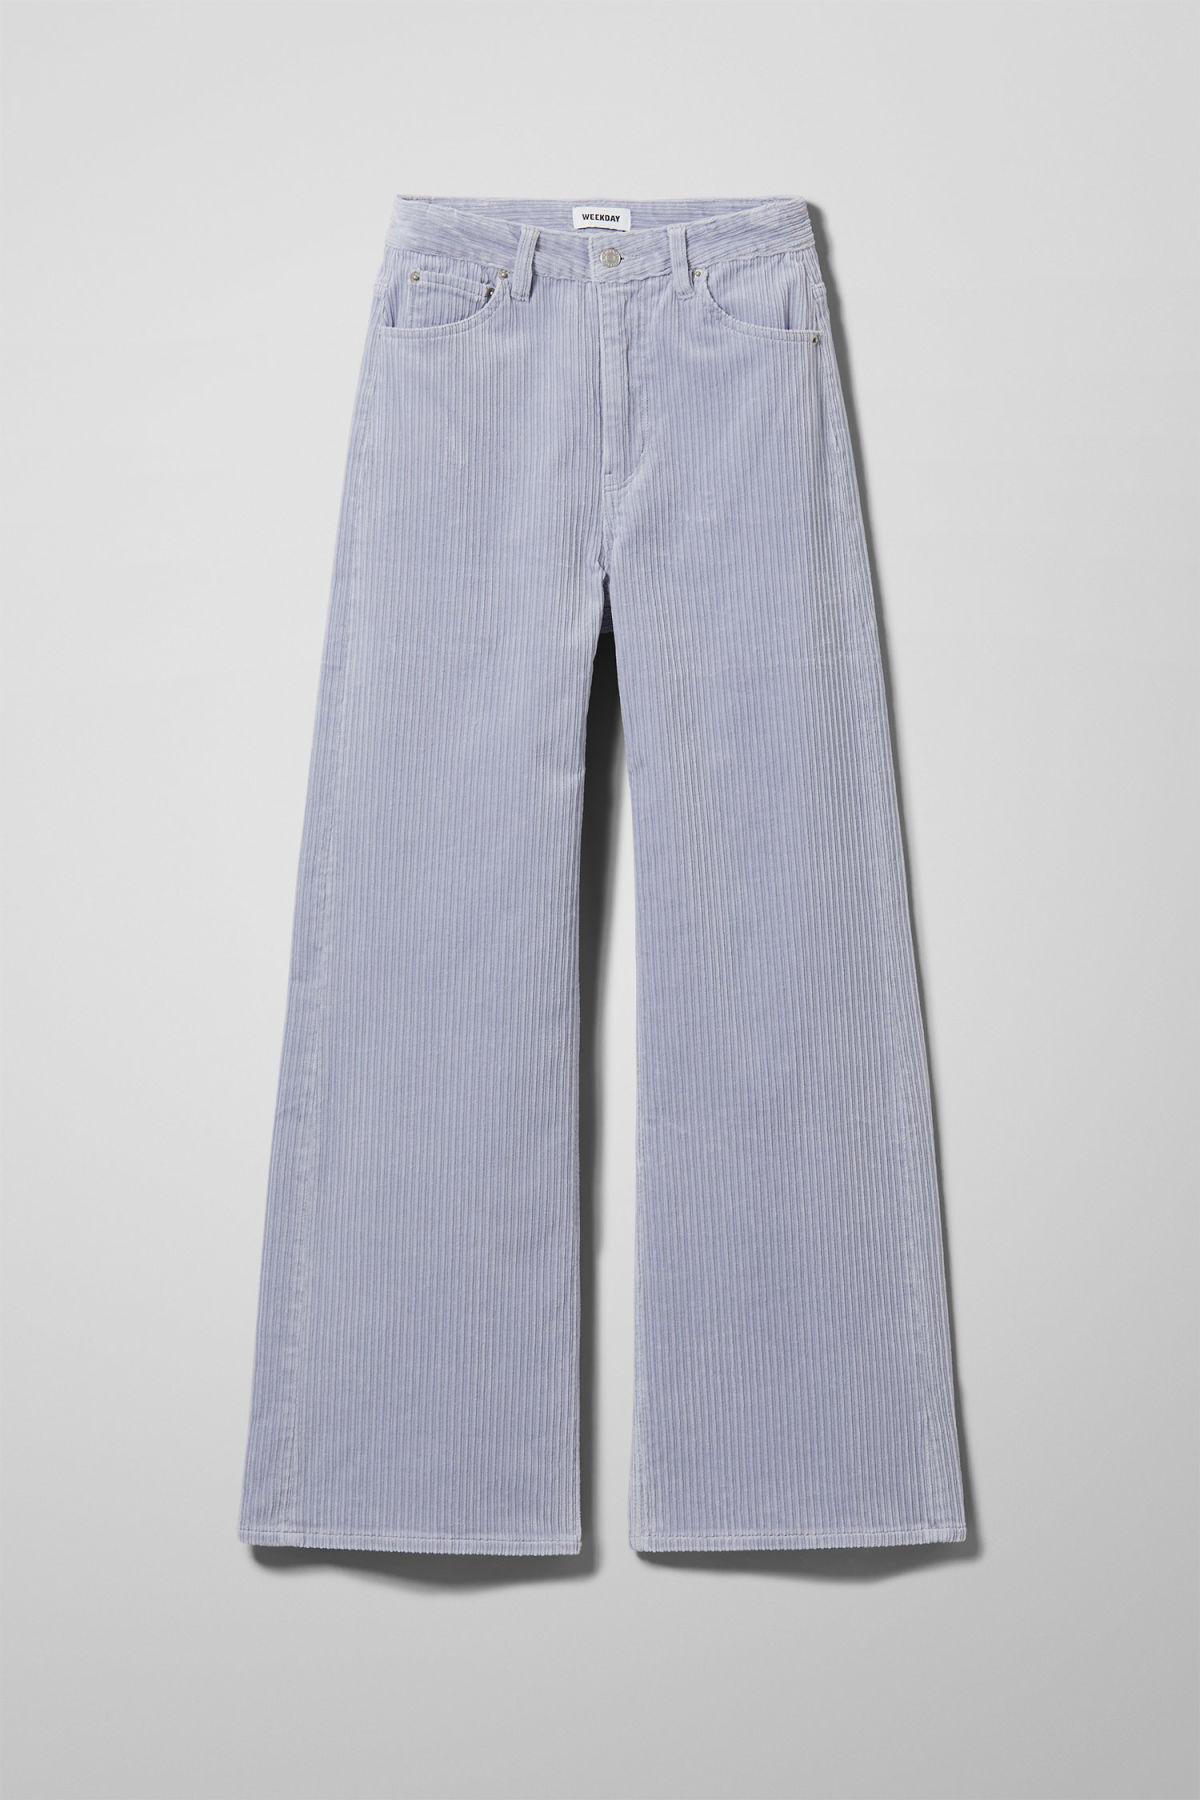 Ace Corduroy Trousers - Purple